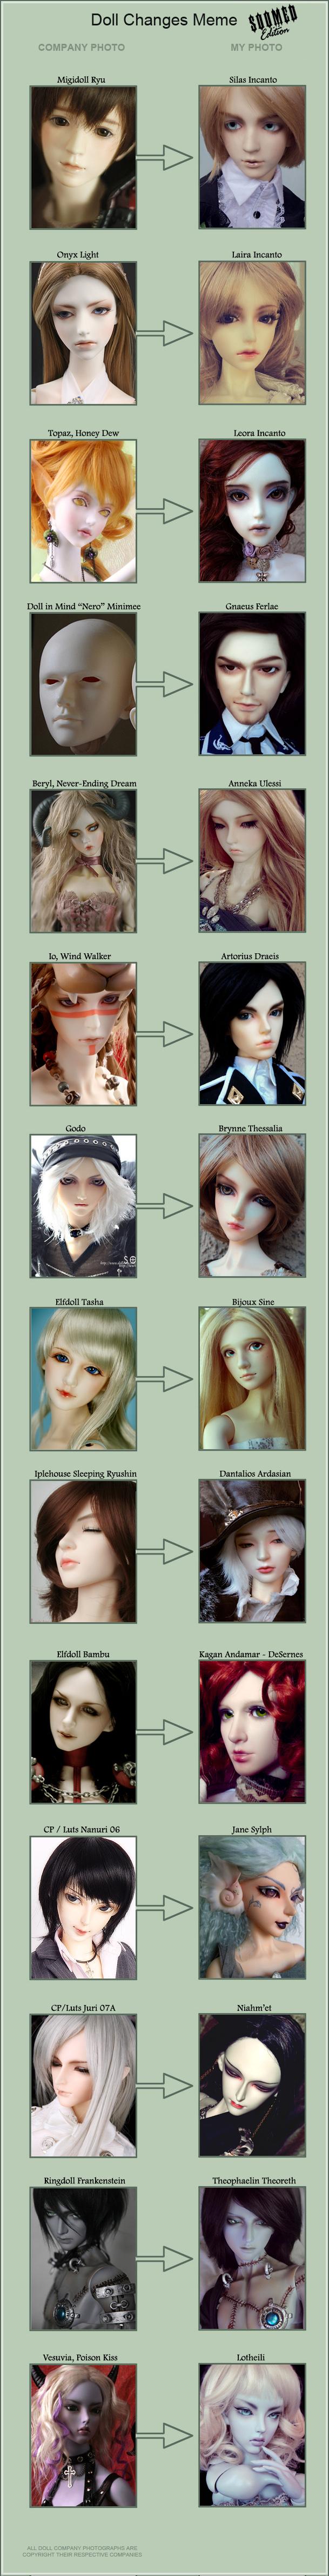 Doll Changes Meme - Elaris by Echoes-of-Elaris